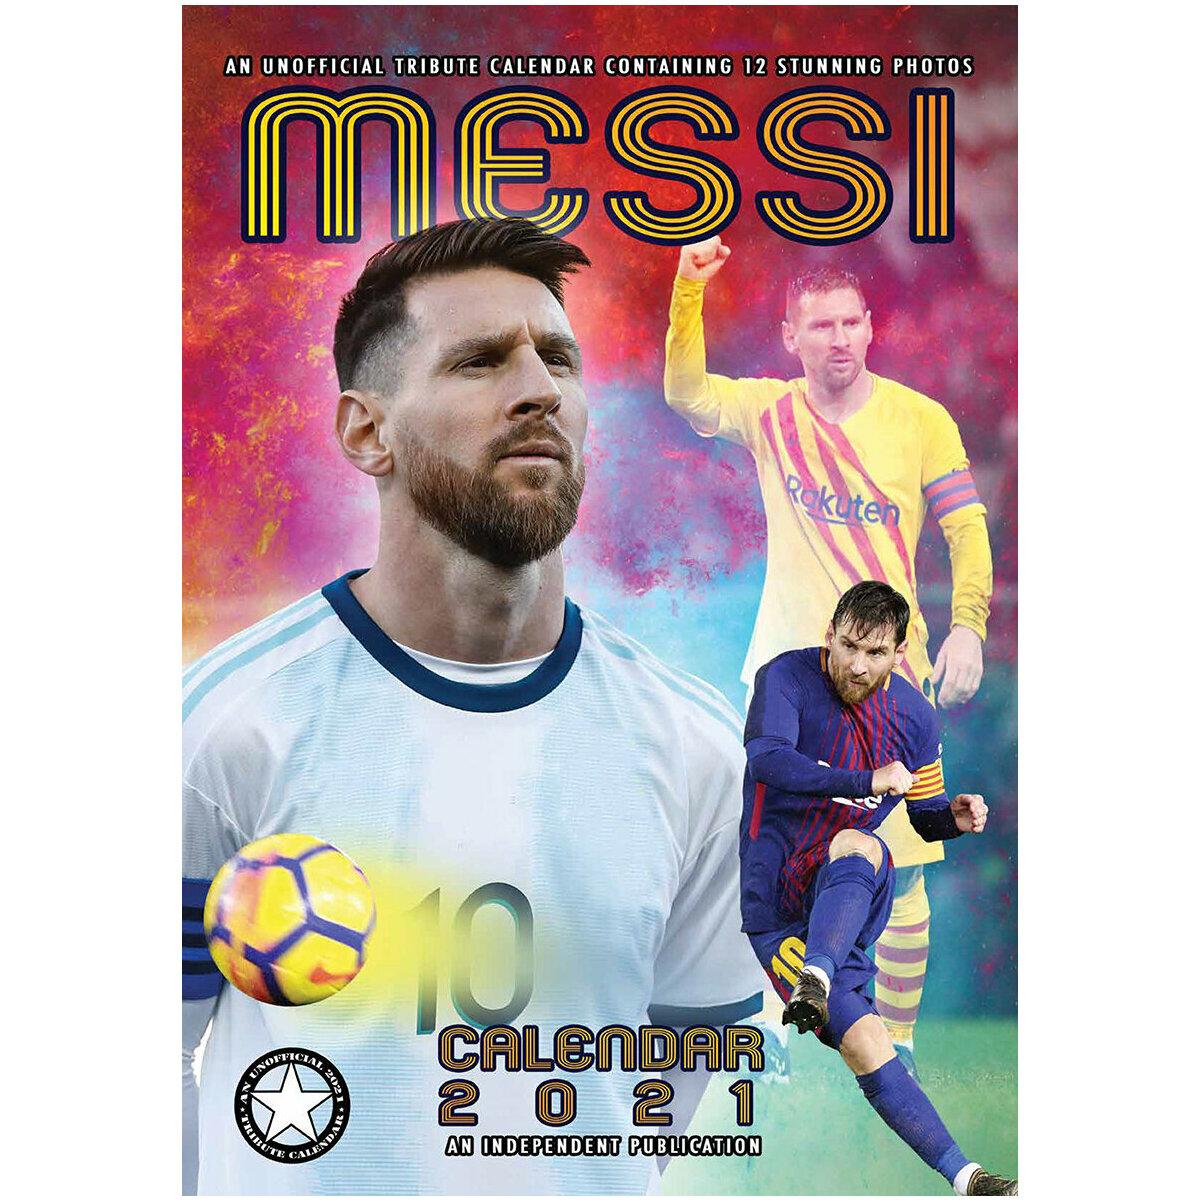 Calendrier 2021 Lionel Messi format A3